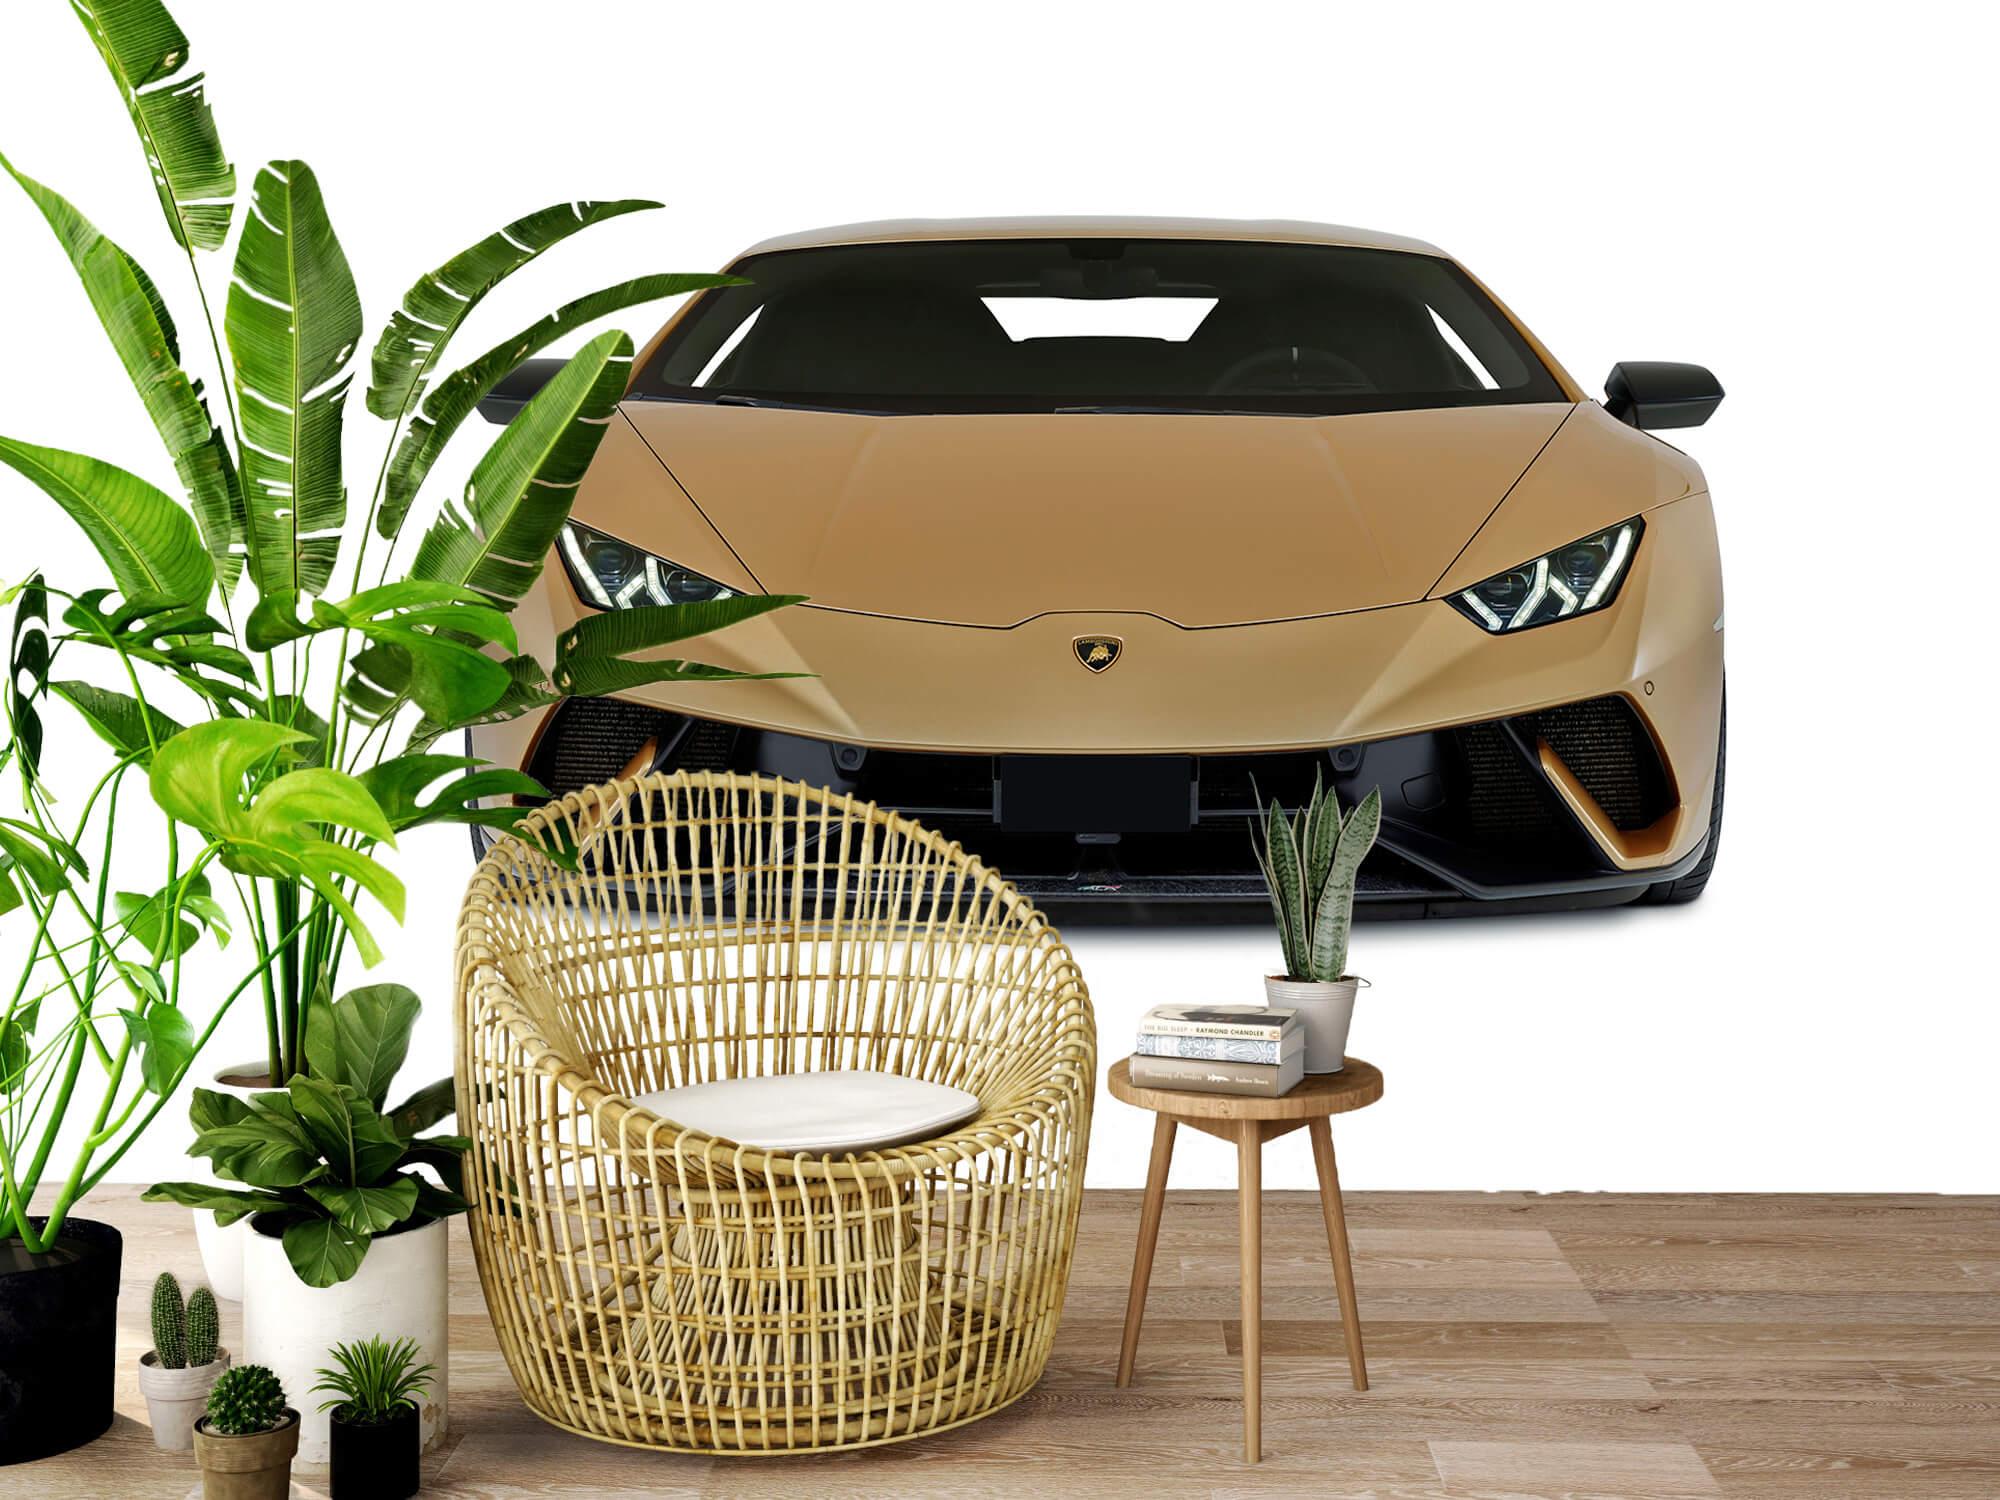 Wallpaper Lamborghini Huracán - Voorkant, wit 3